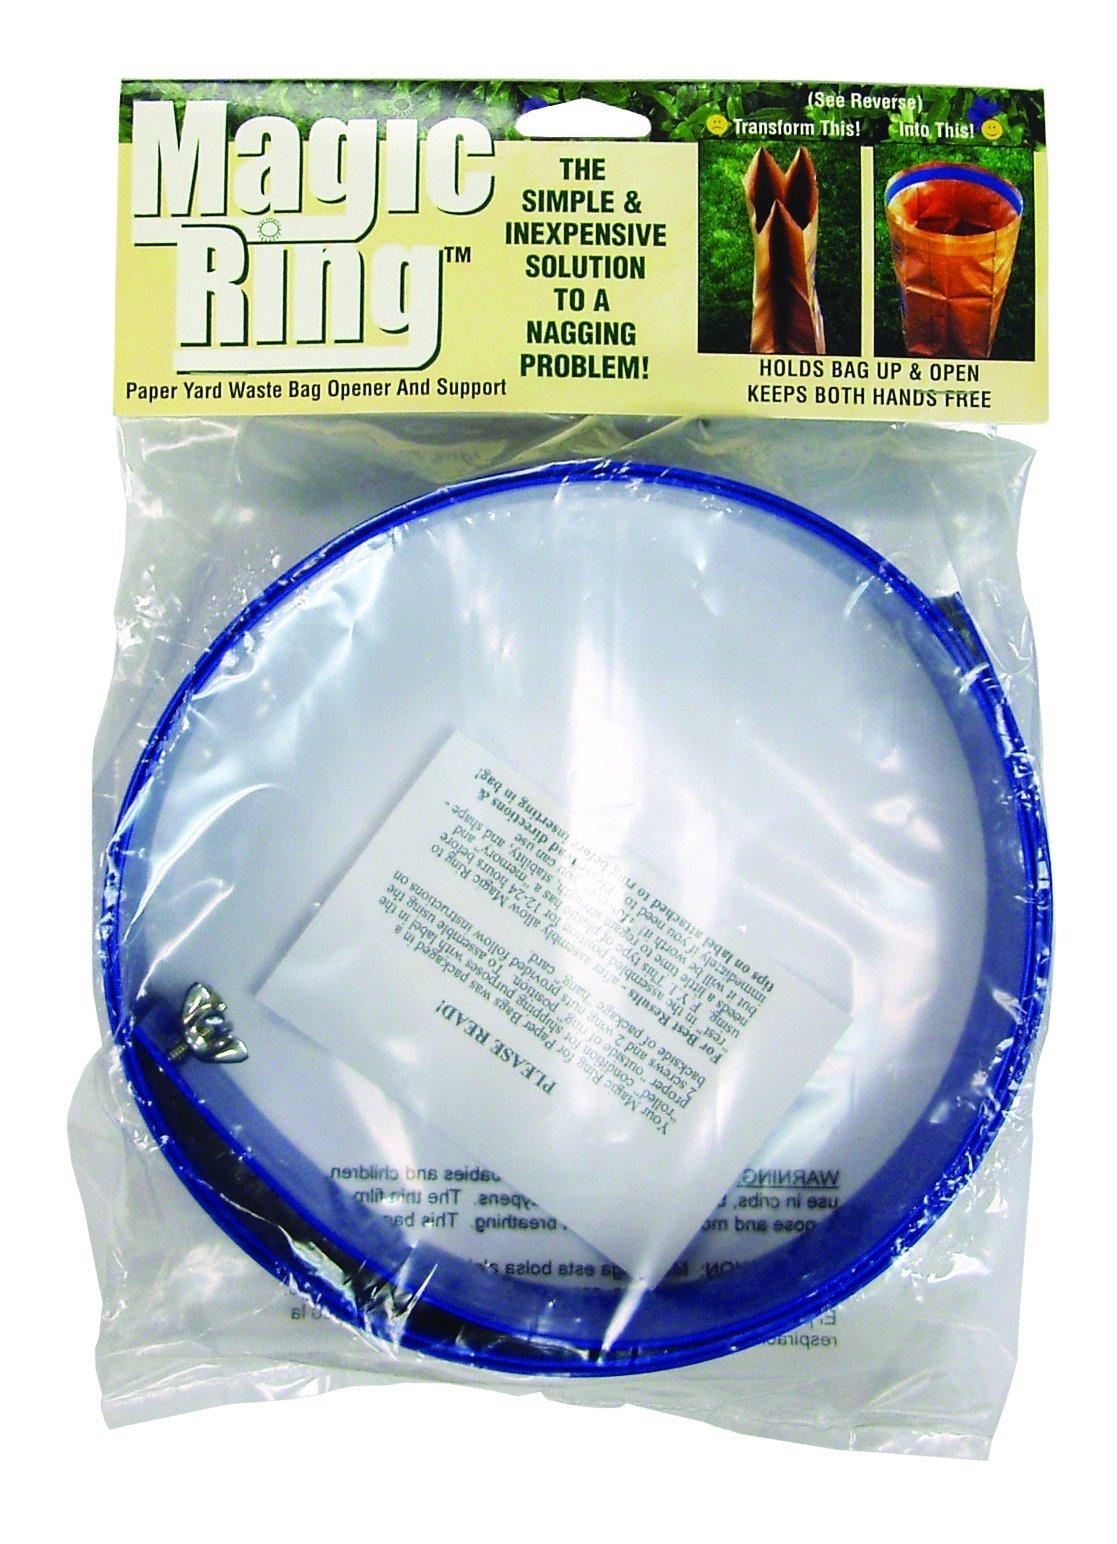 The Rumford Gardener MGR1000 Magic Ring Yard Cleanup Paper Bag Helper by The Rumford Gardener